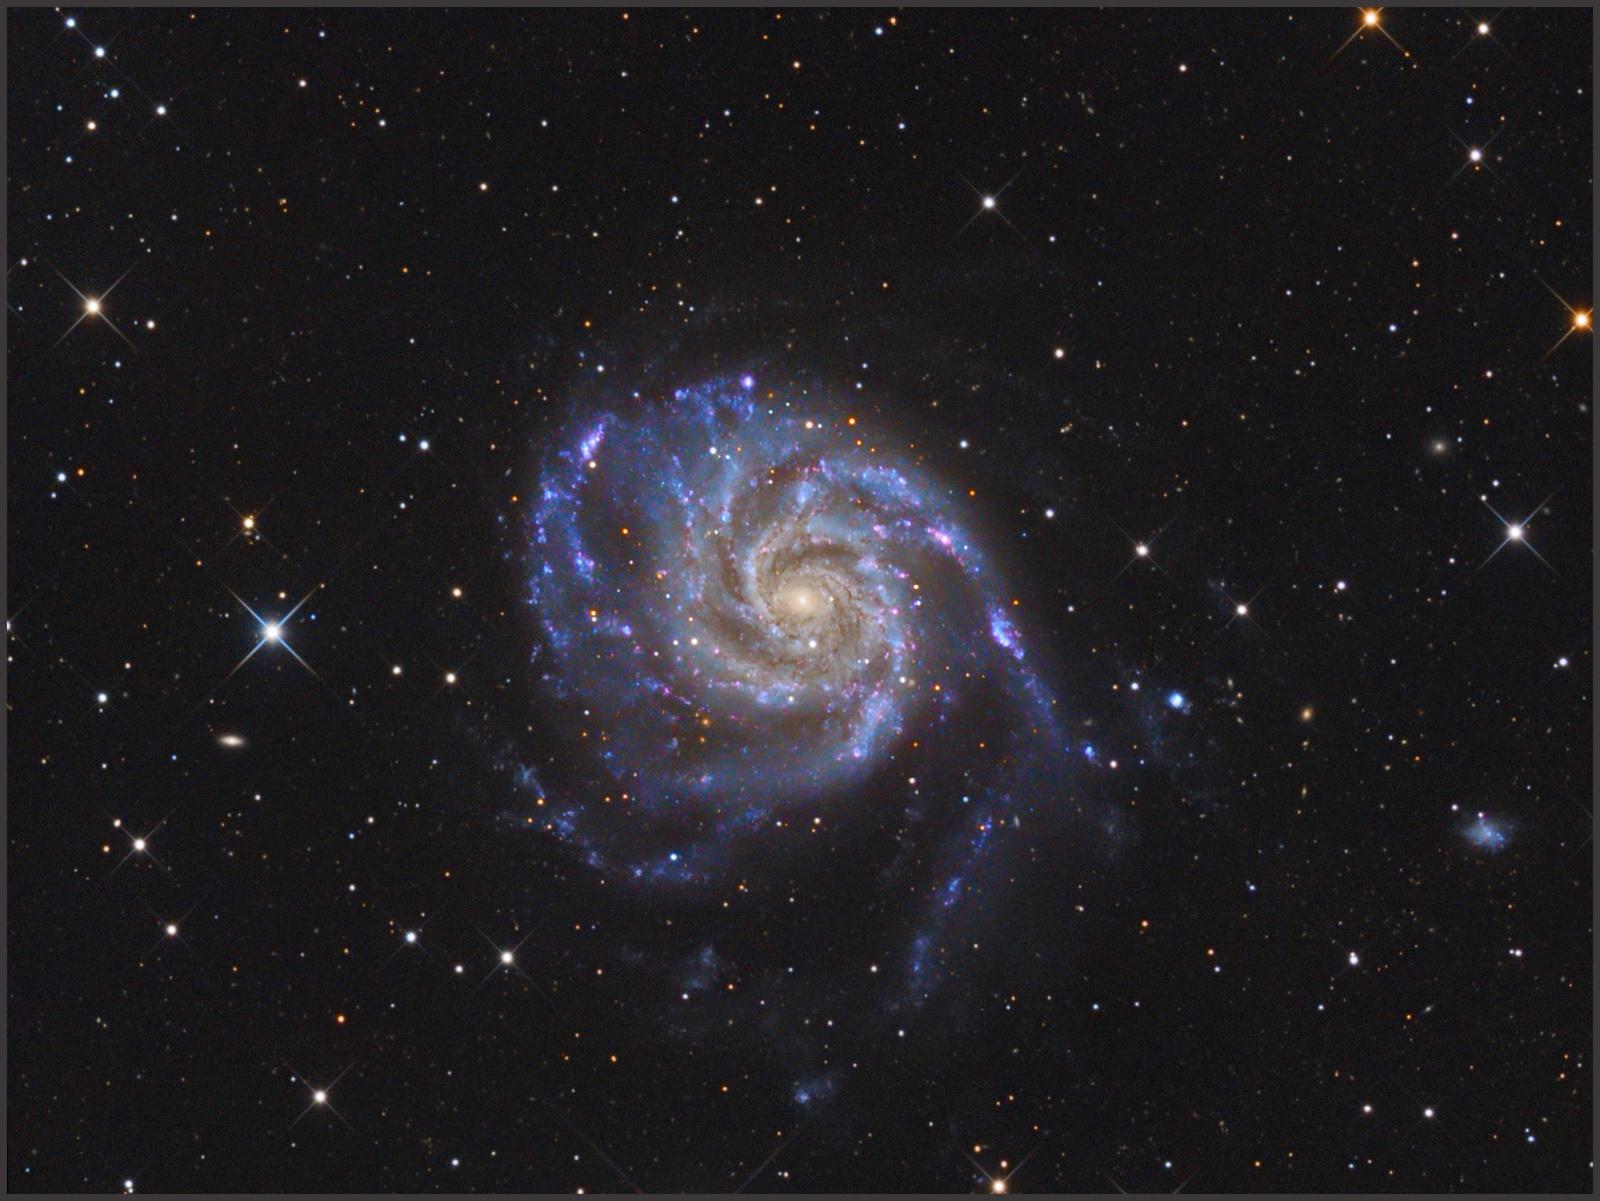 M101-LRGBbis1.jpg